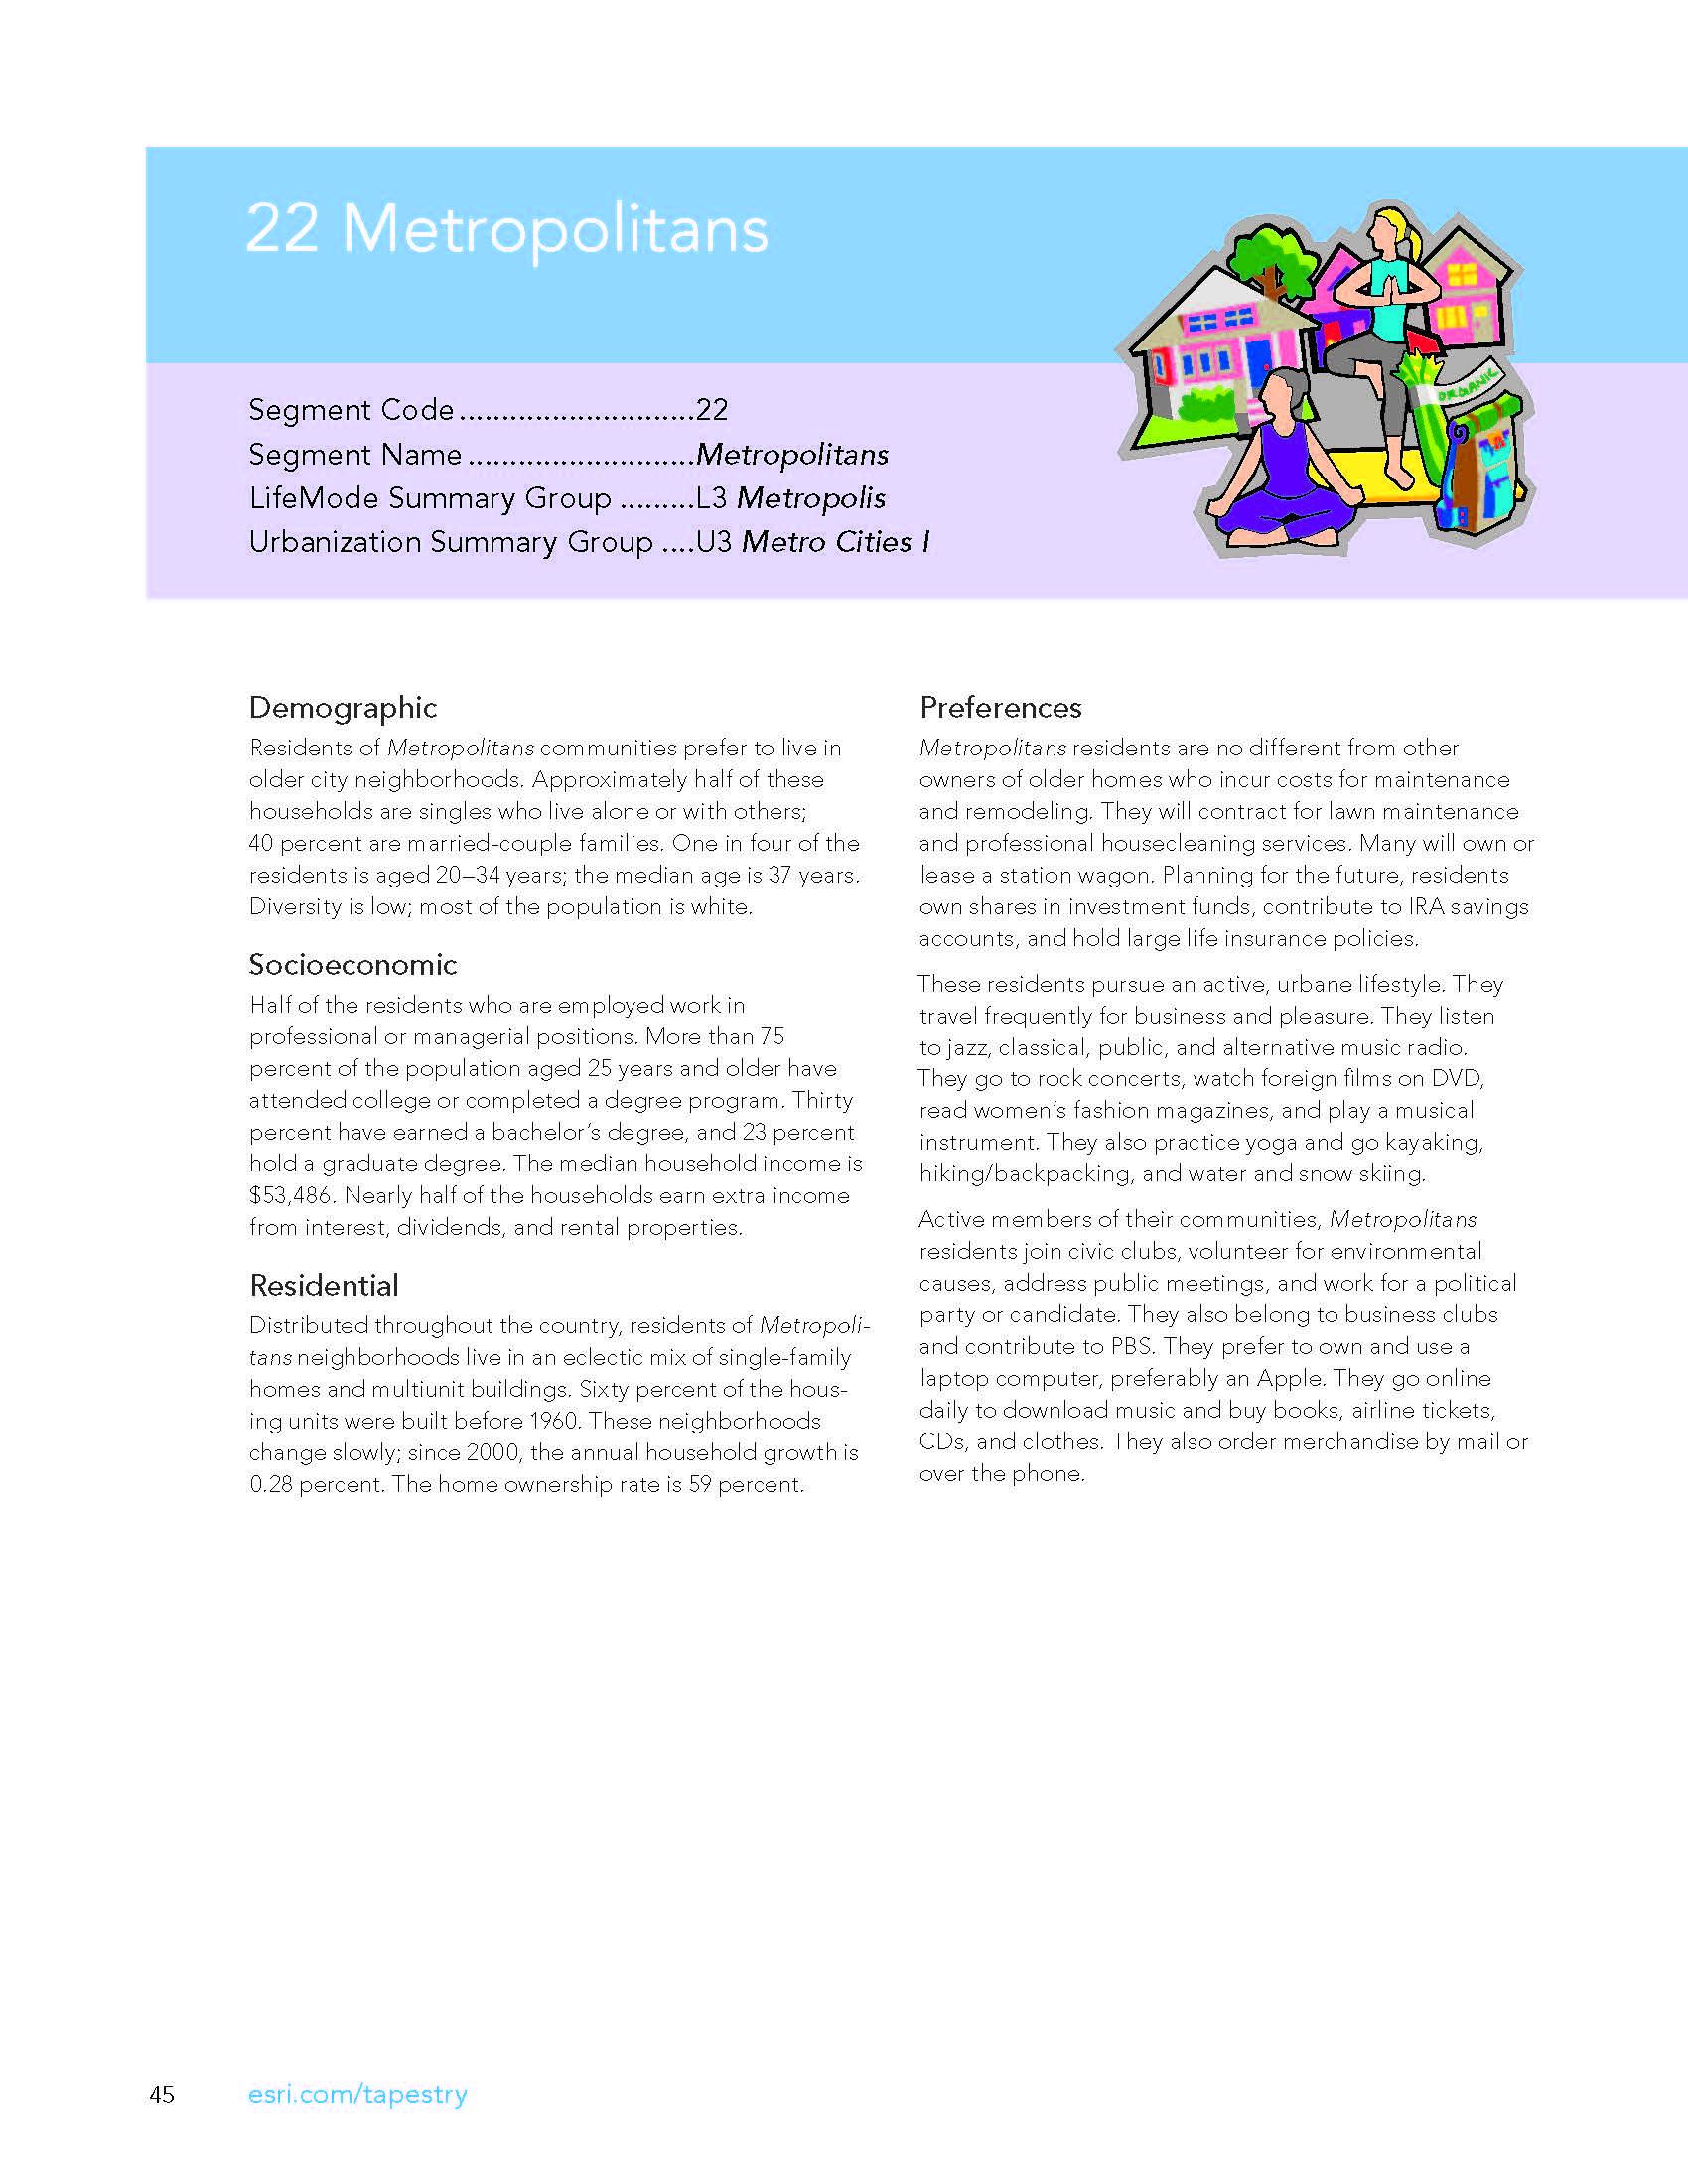 tapestry-segmentation_Page_48.jpg